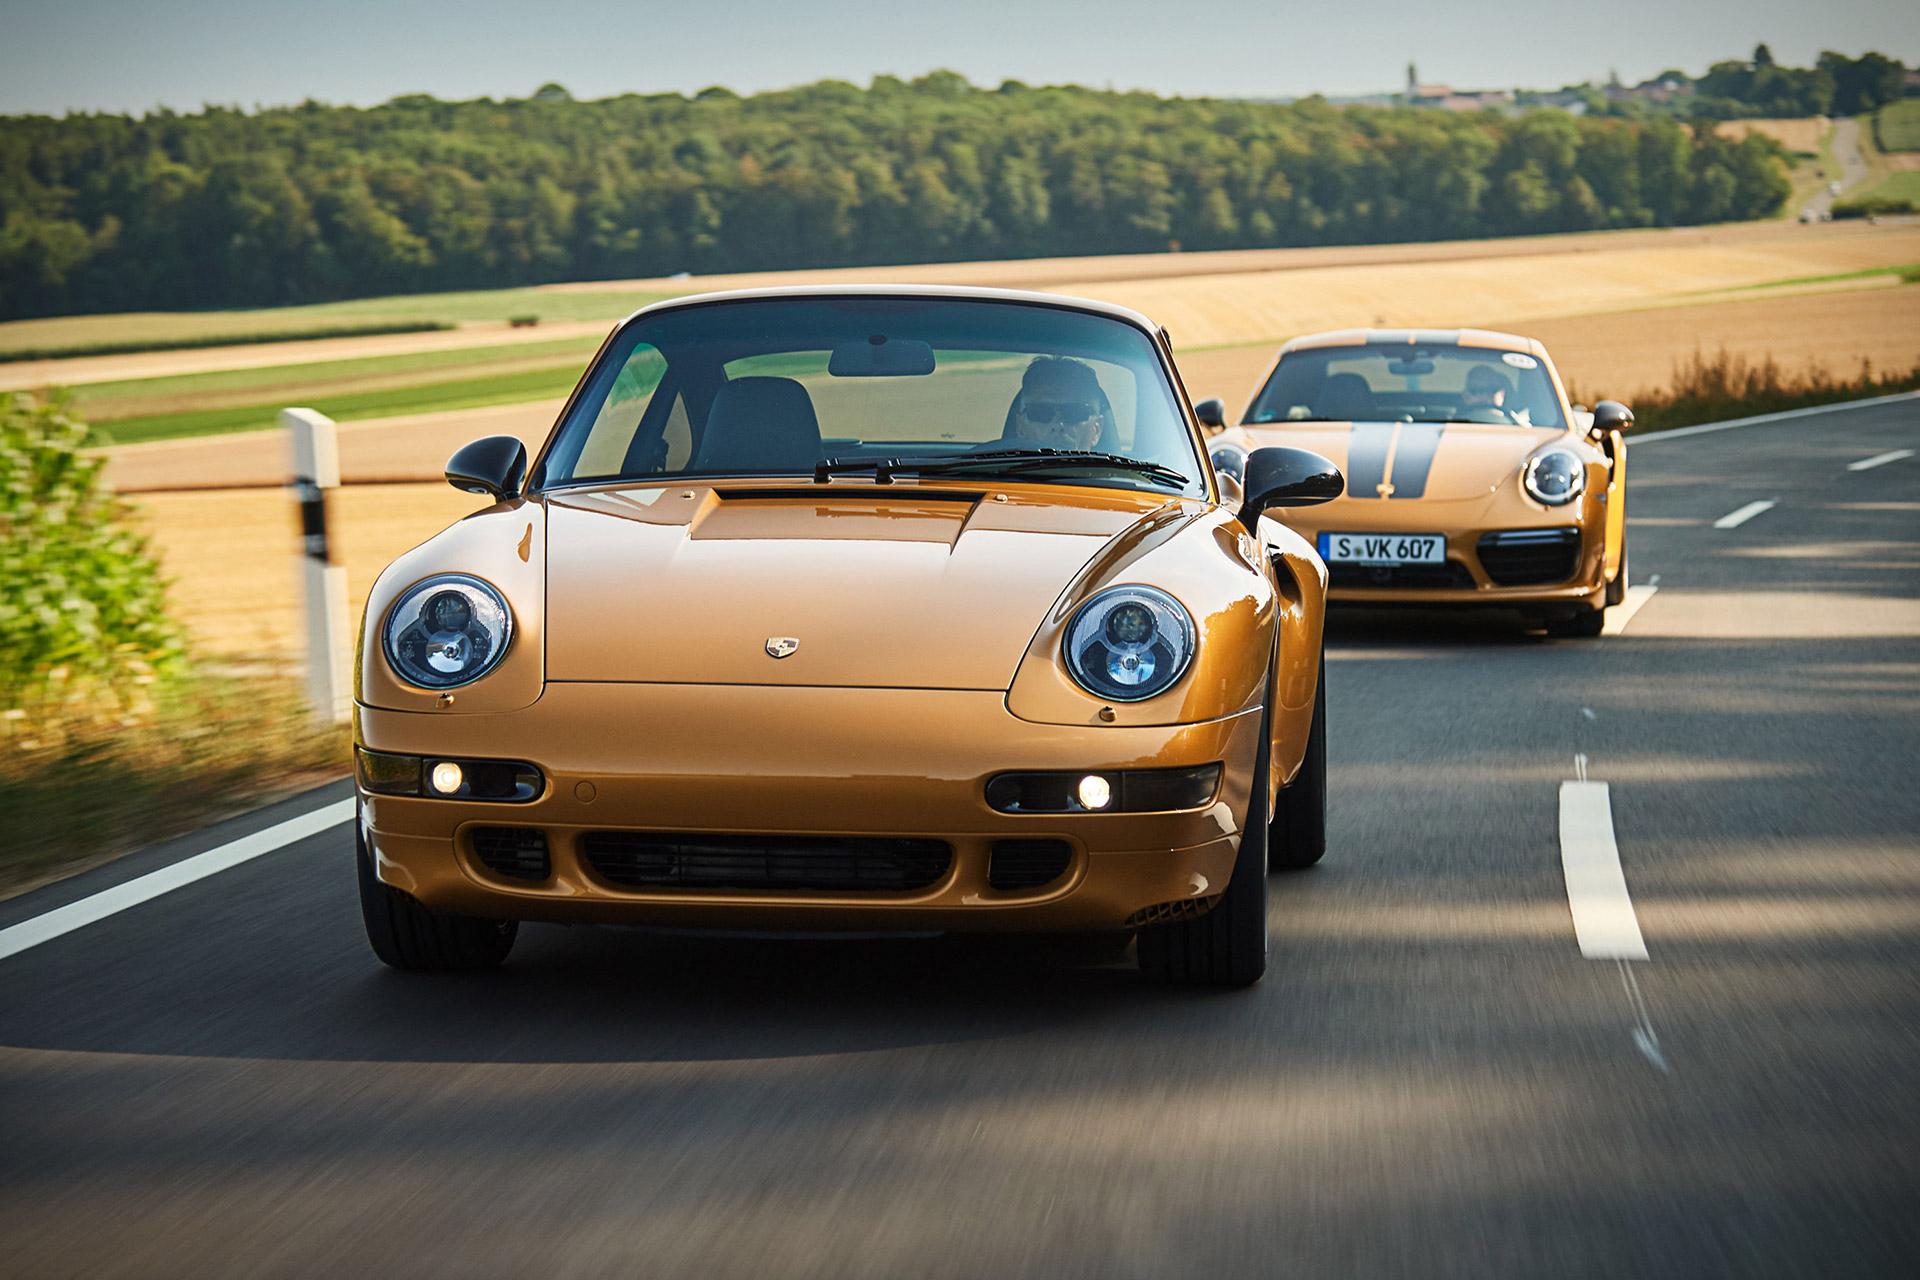 Porsche Project Gold 911 Turbo Coupe